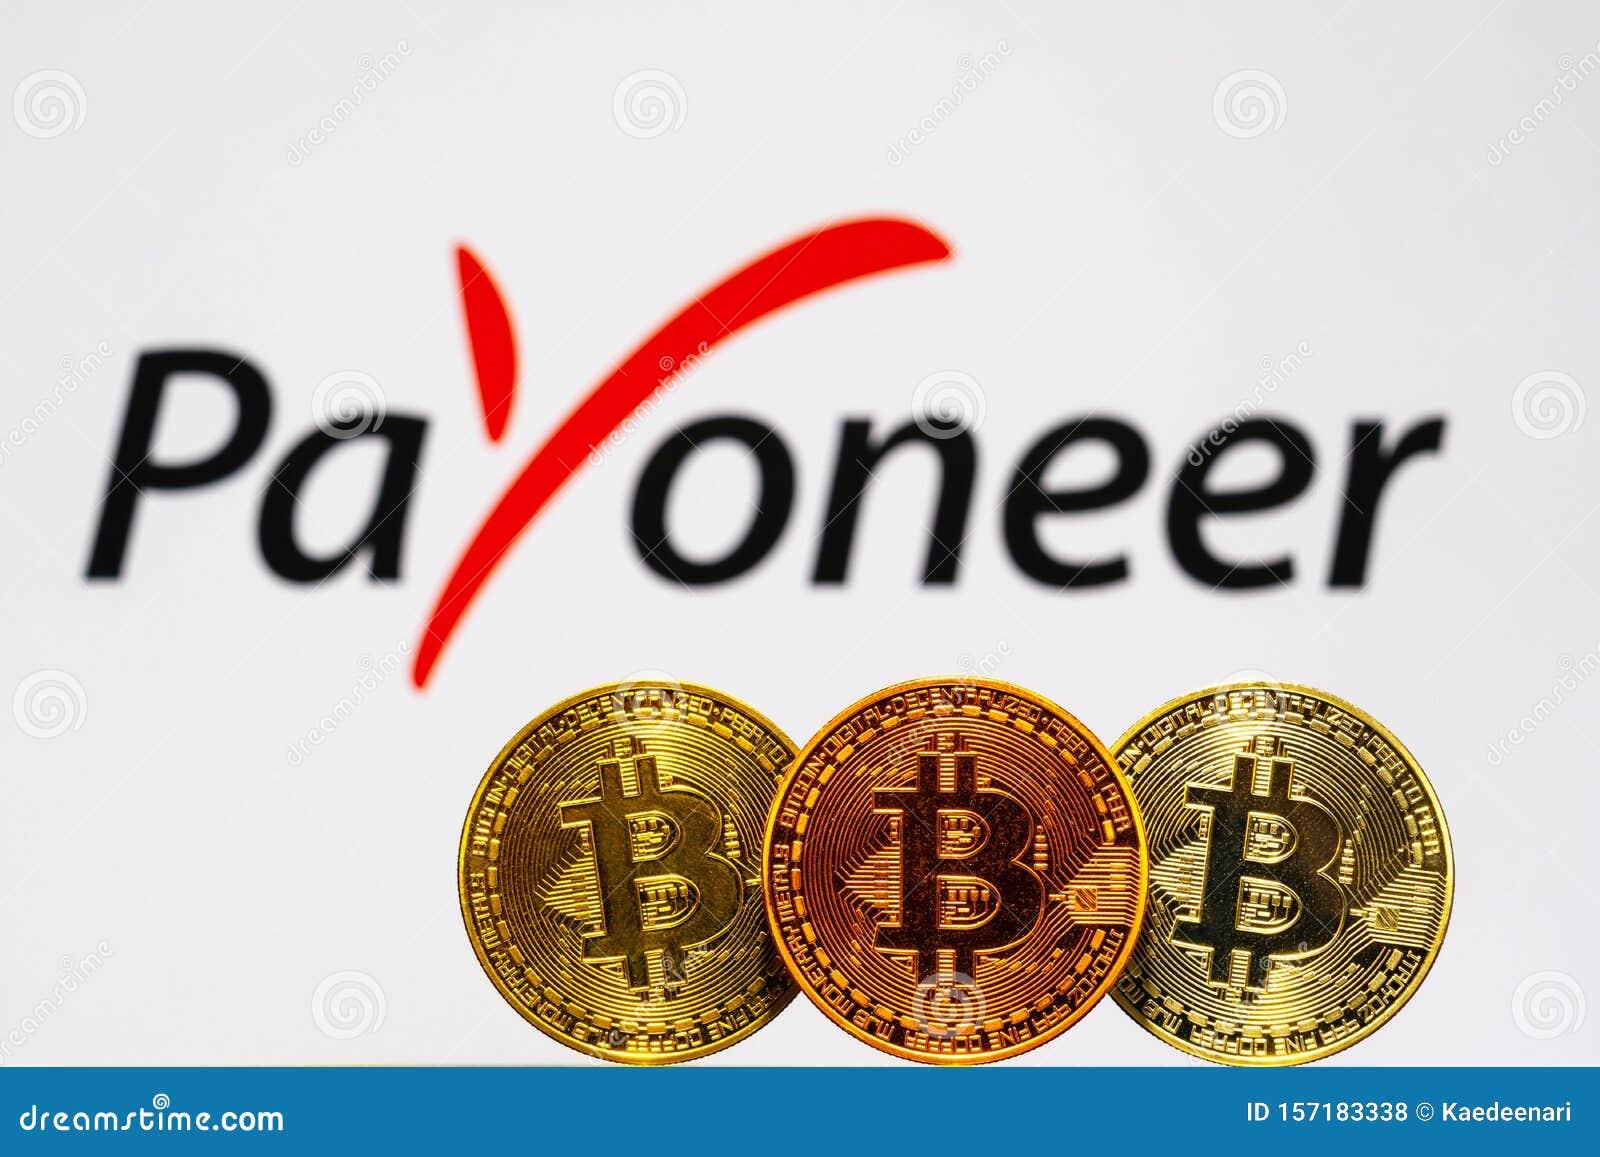 payoneer bitcoin bitcoin pizza 10000